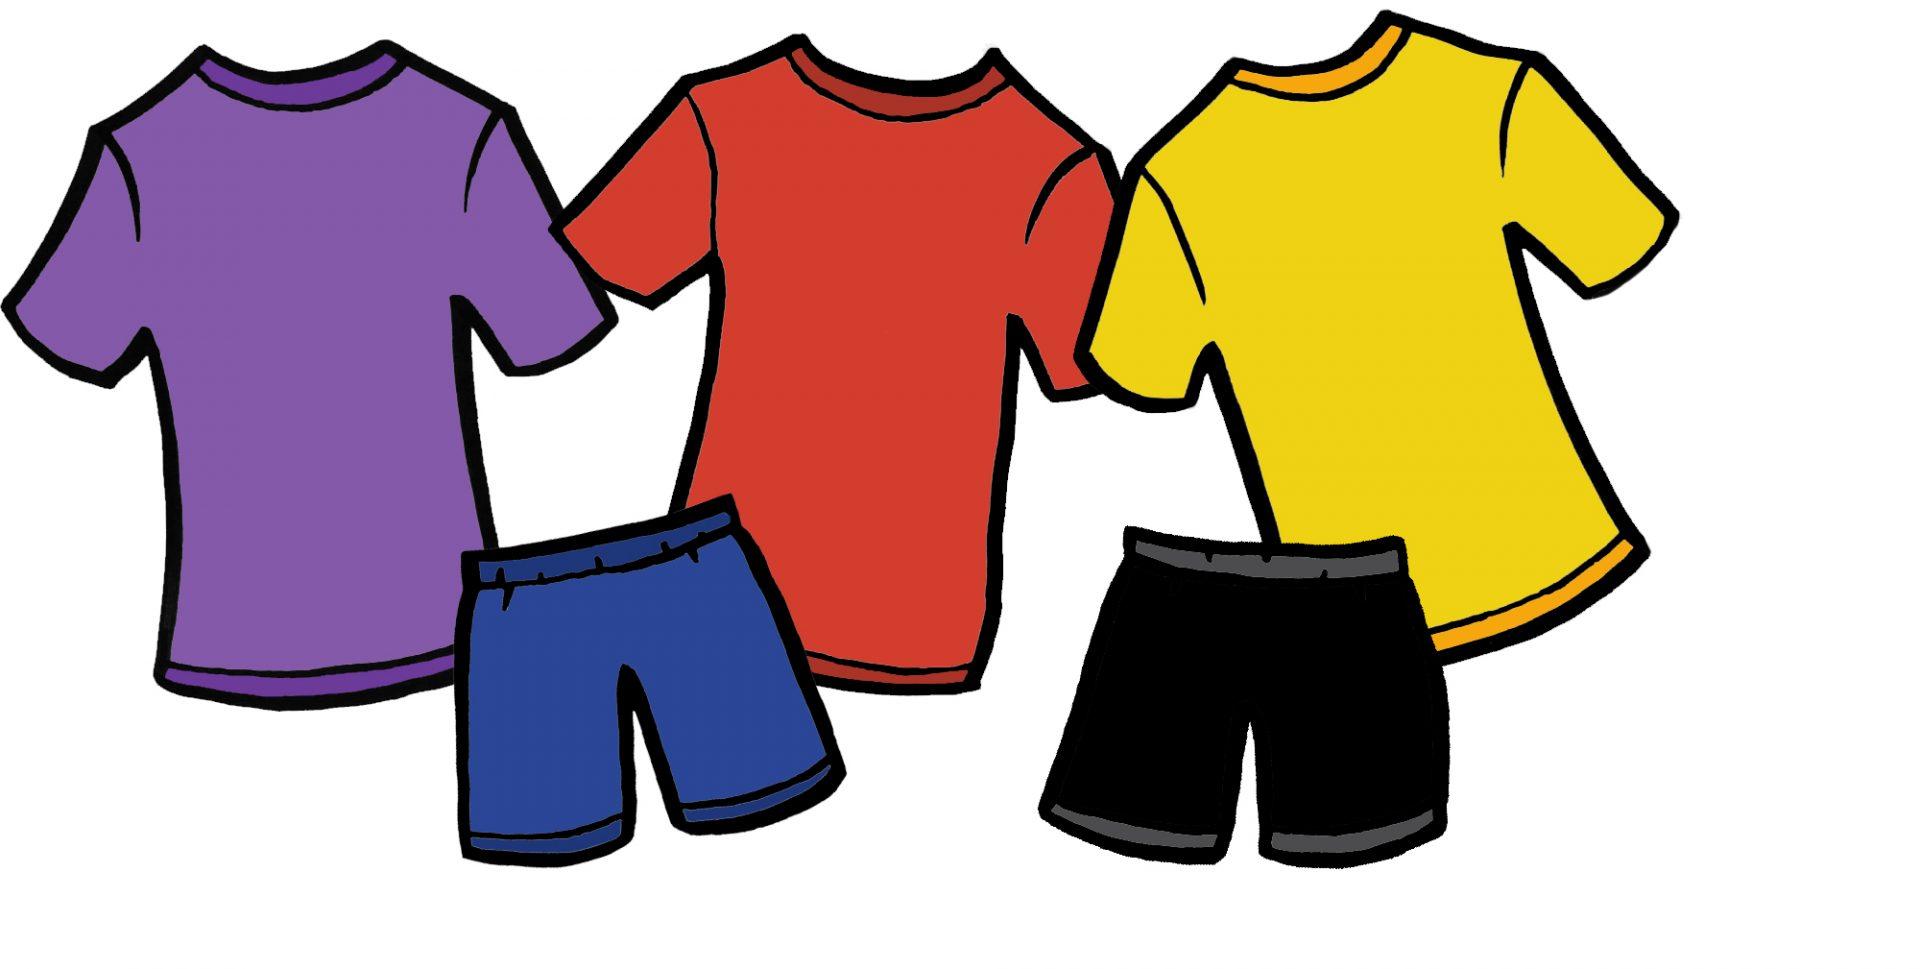 Drawing of t-shirts and shorts